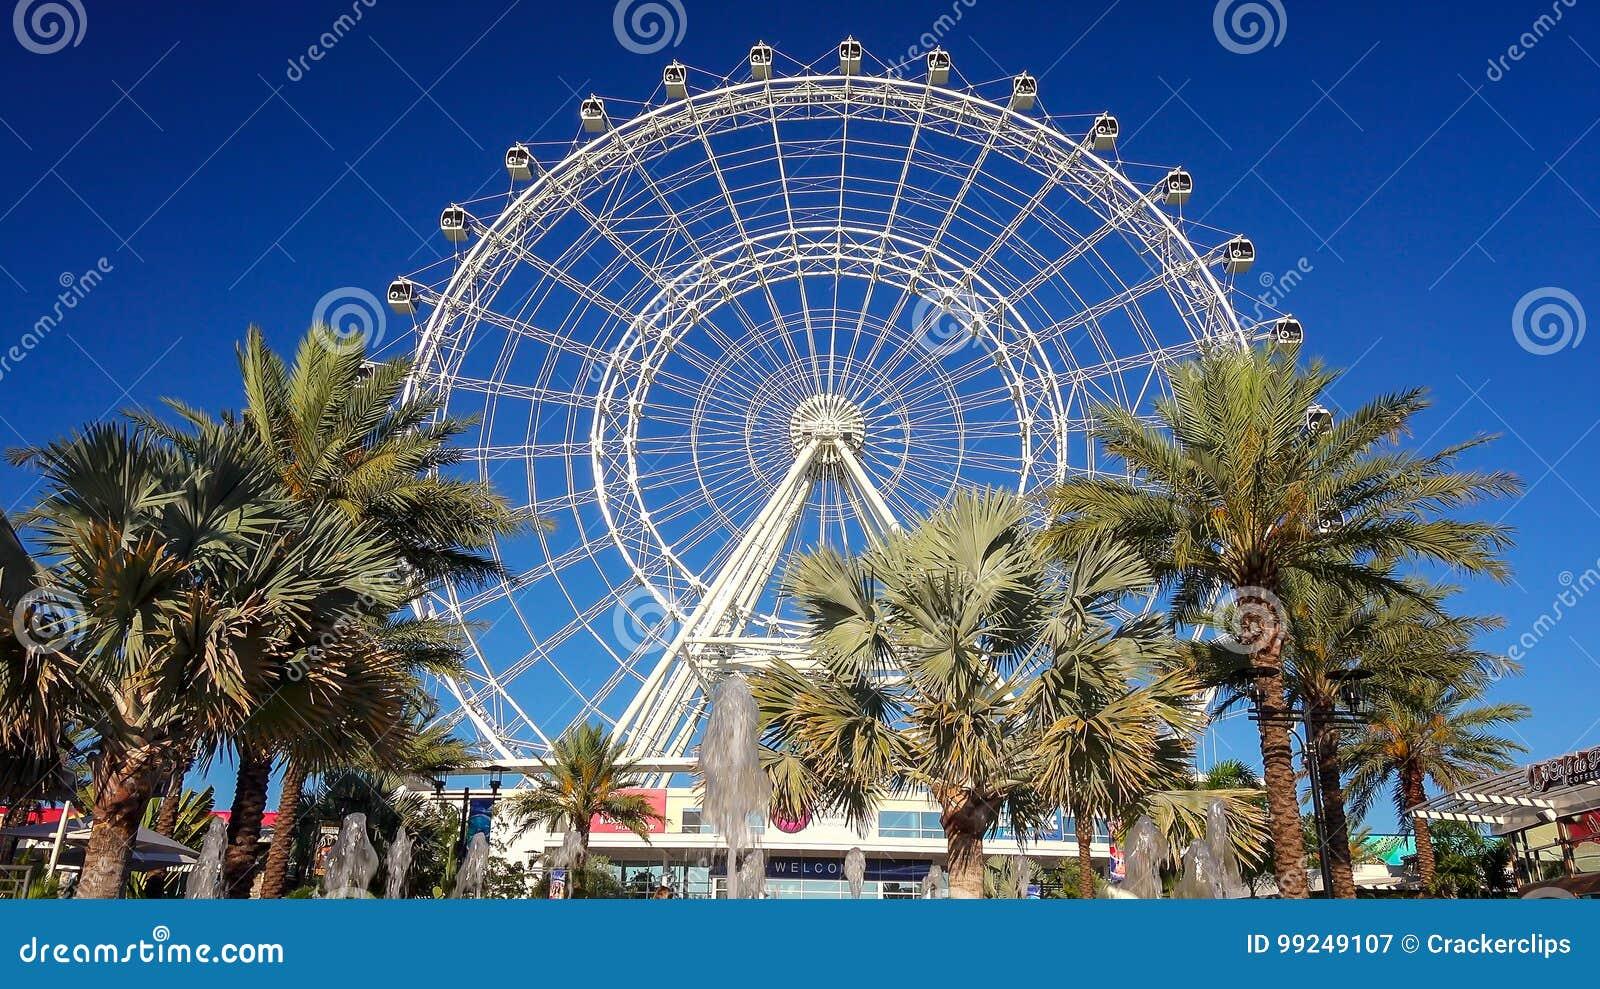 Orlando Eye Observation Wheel in Orlando, Florida